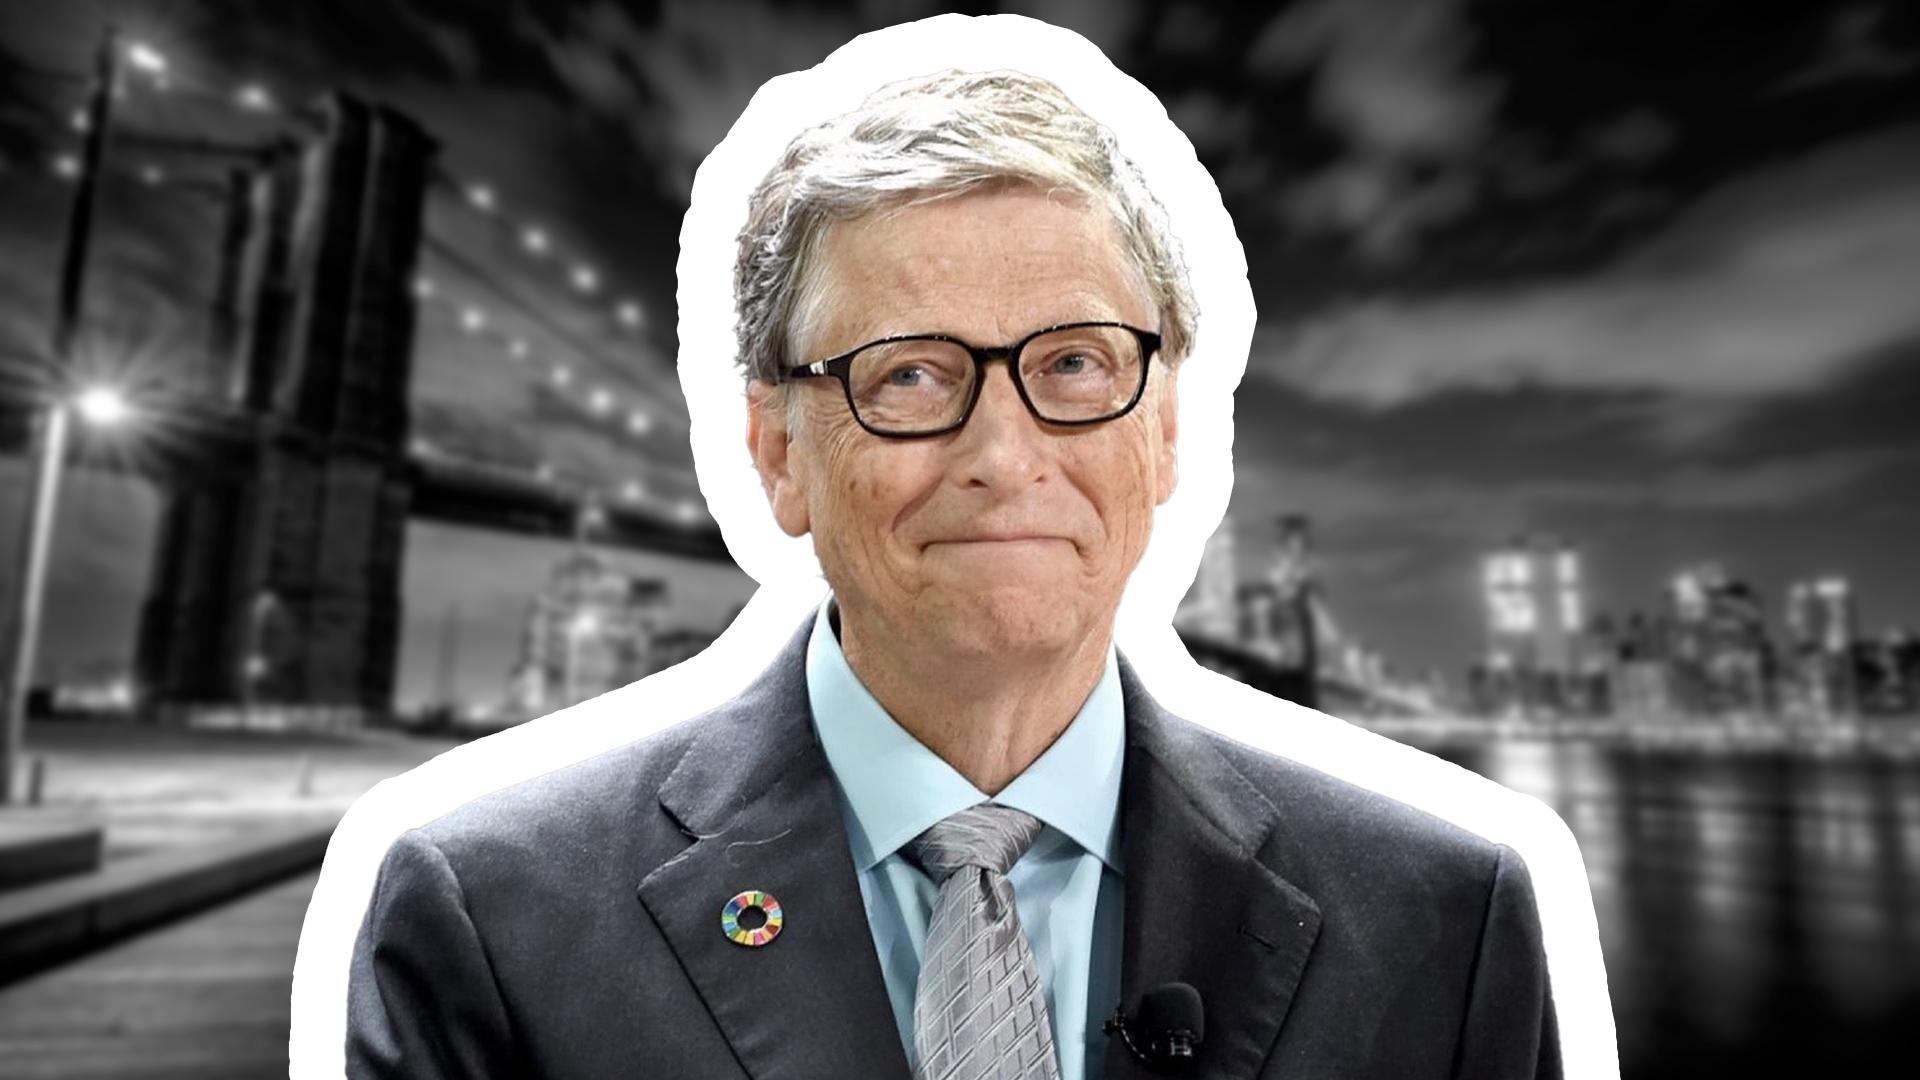 Ceo, Bill Gates, Gates, People, Leute, William Henry Gates, Personen, Microsoft Management